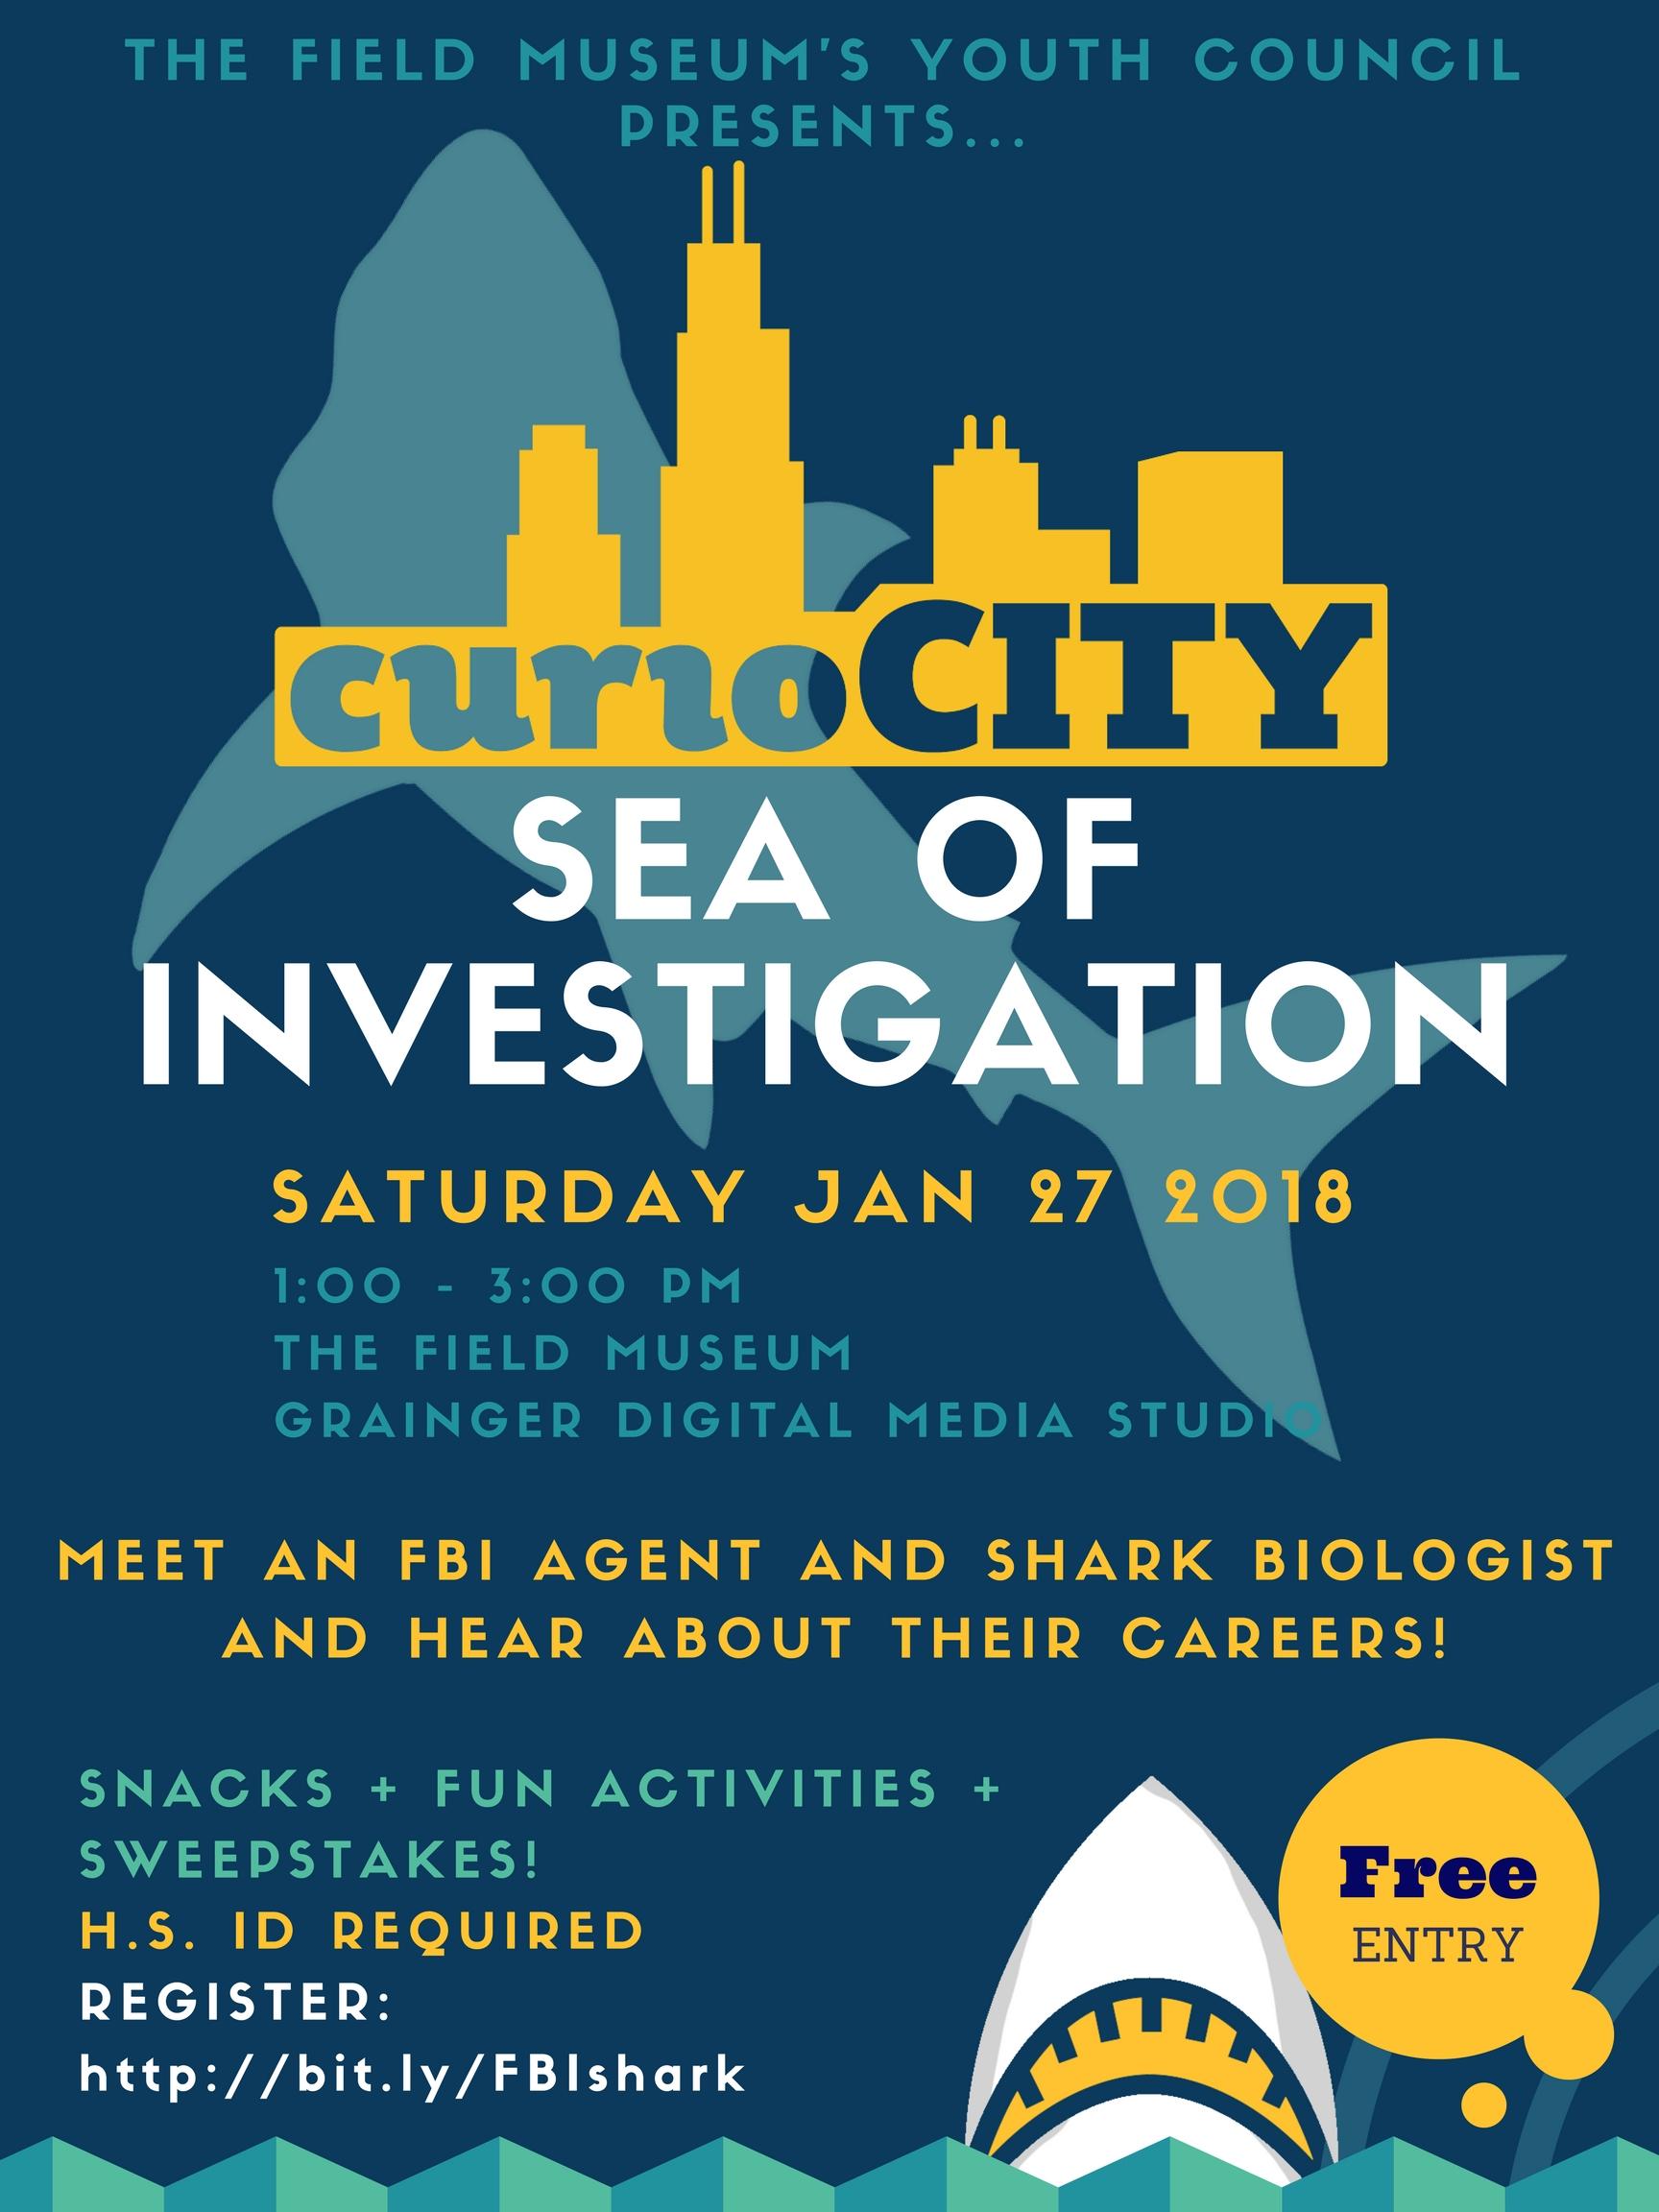 curioCITY: Sea of Investigation